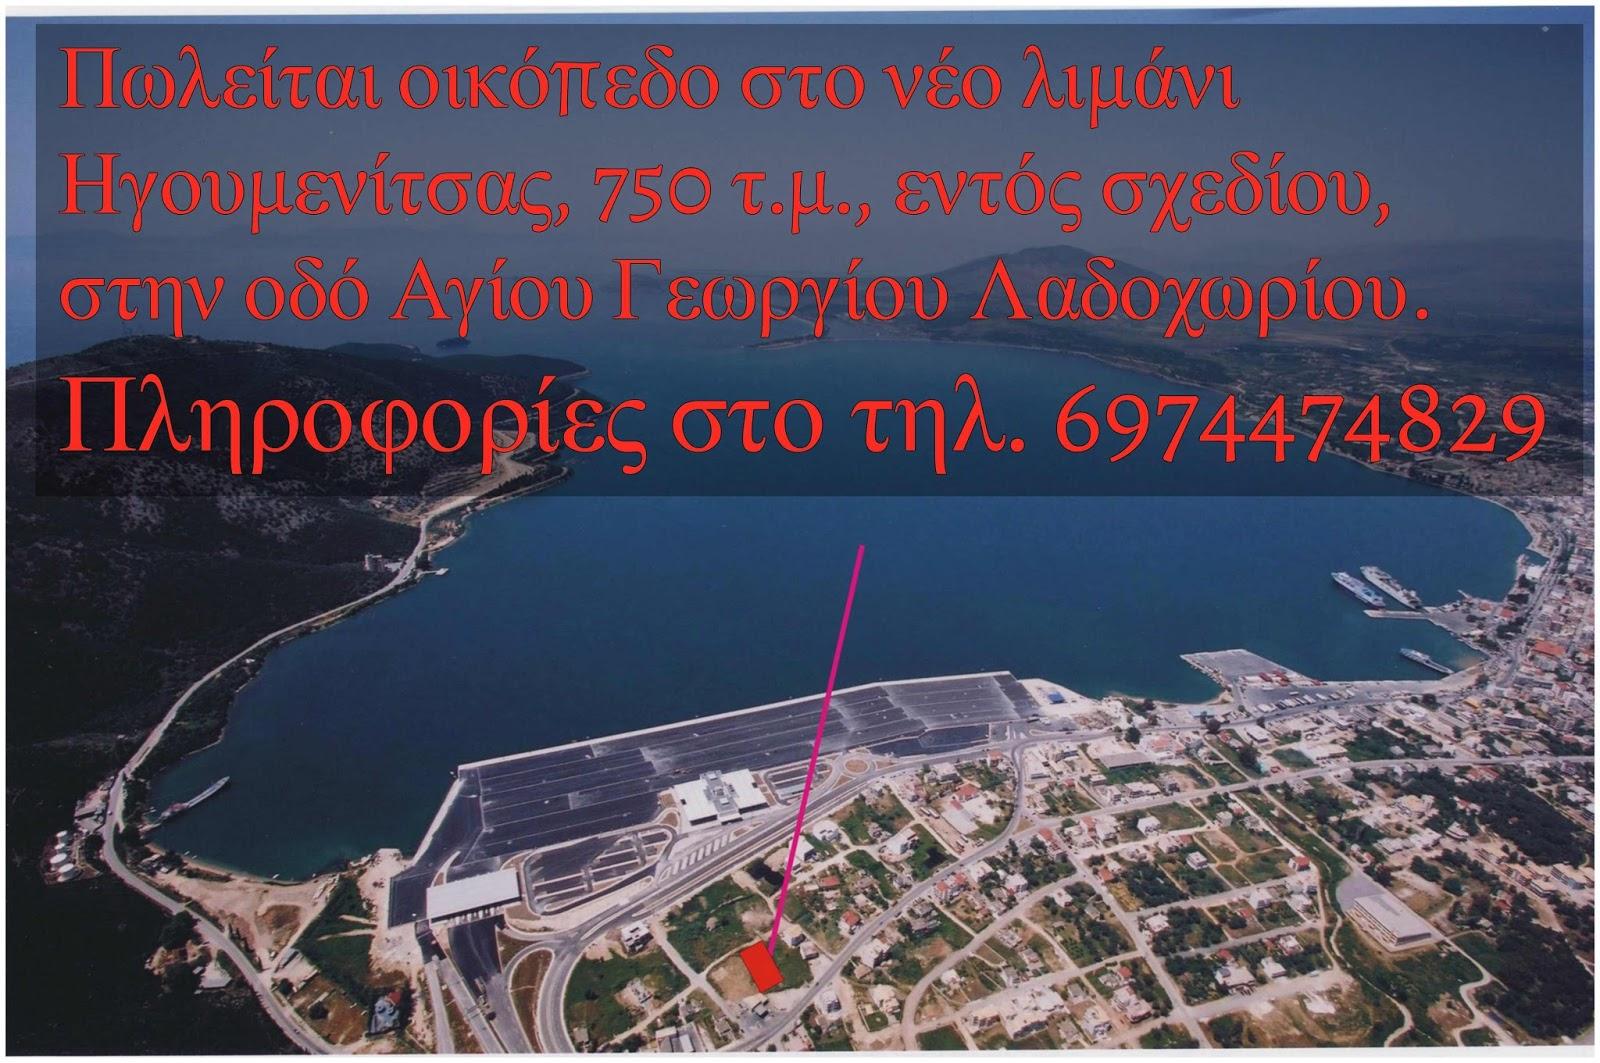 http://i.picasion.com/pic85/398191e92668e0b30740e69c4c3c43a6.gif